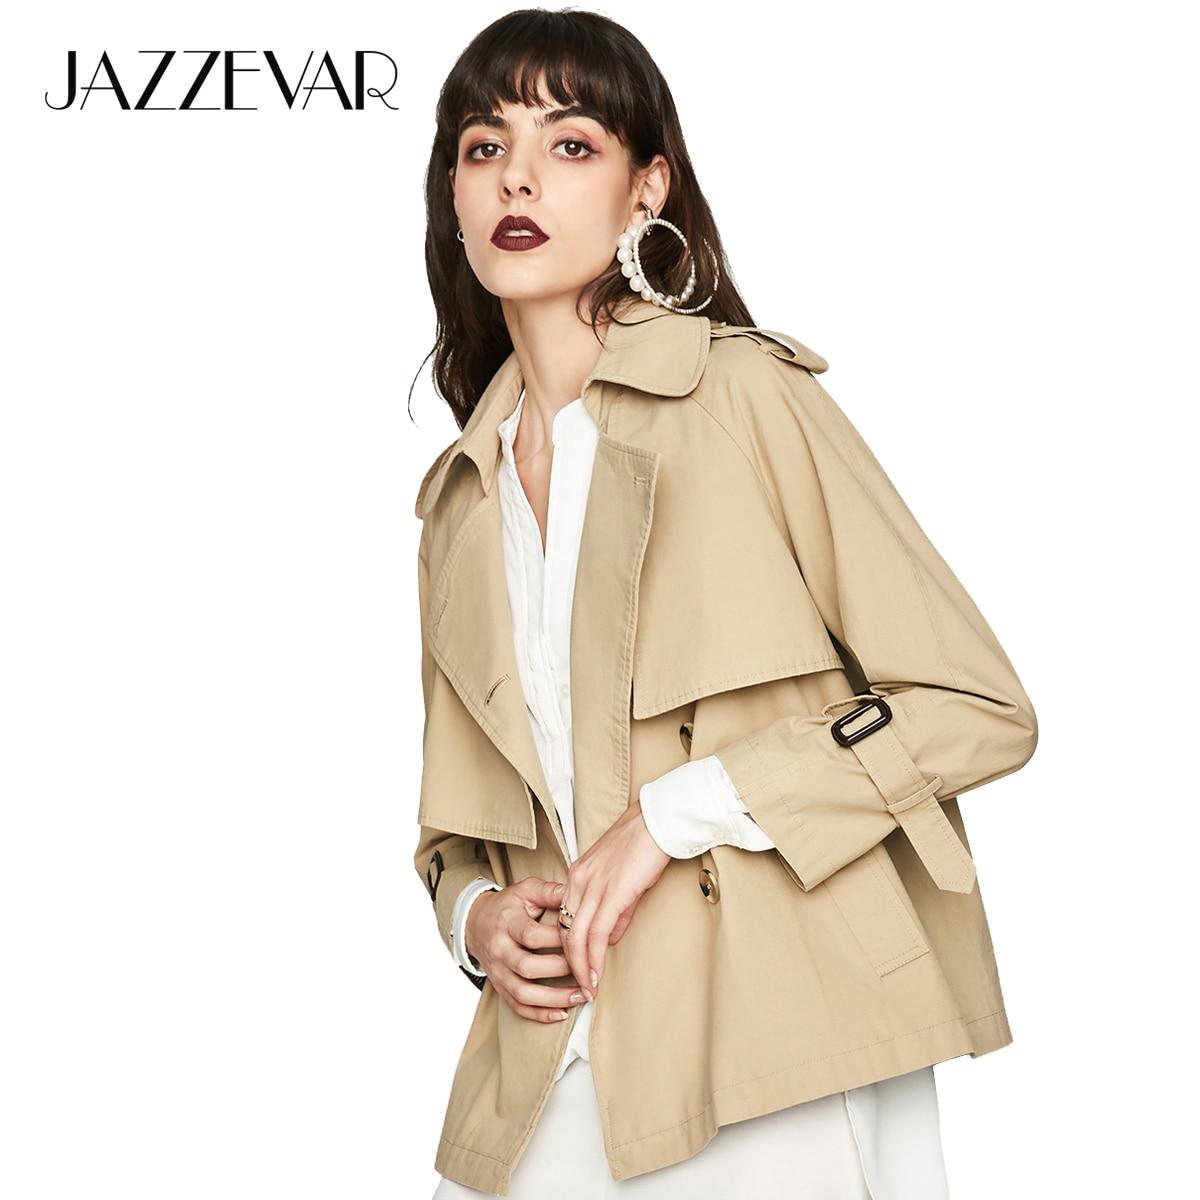 JAZZEVAR 2019 New Autumn Fashion Casual Women s Cotton Washed Double Breasted Jacket Short Loose Clothing